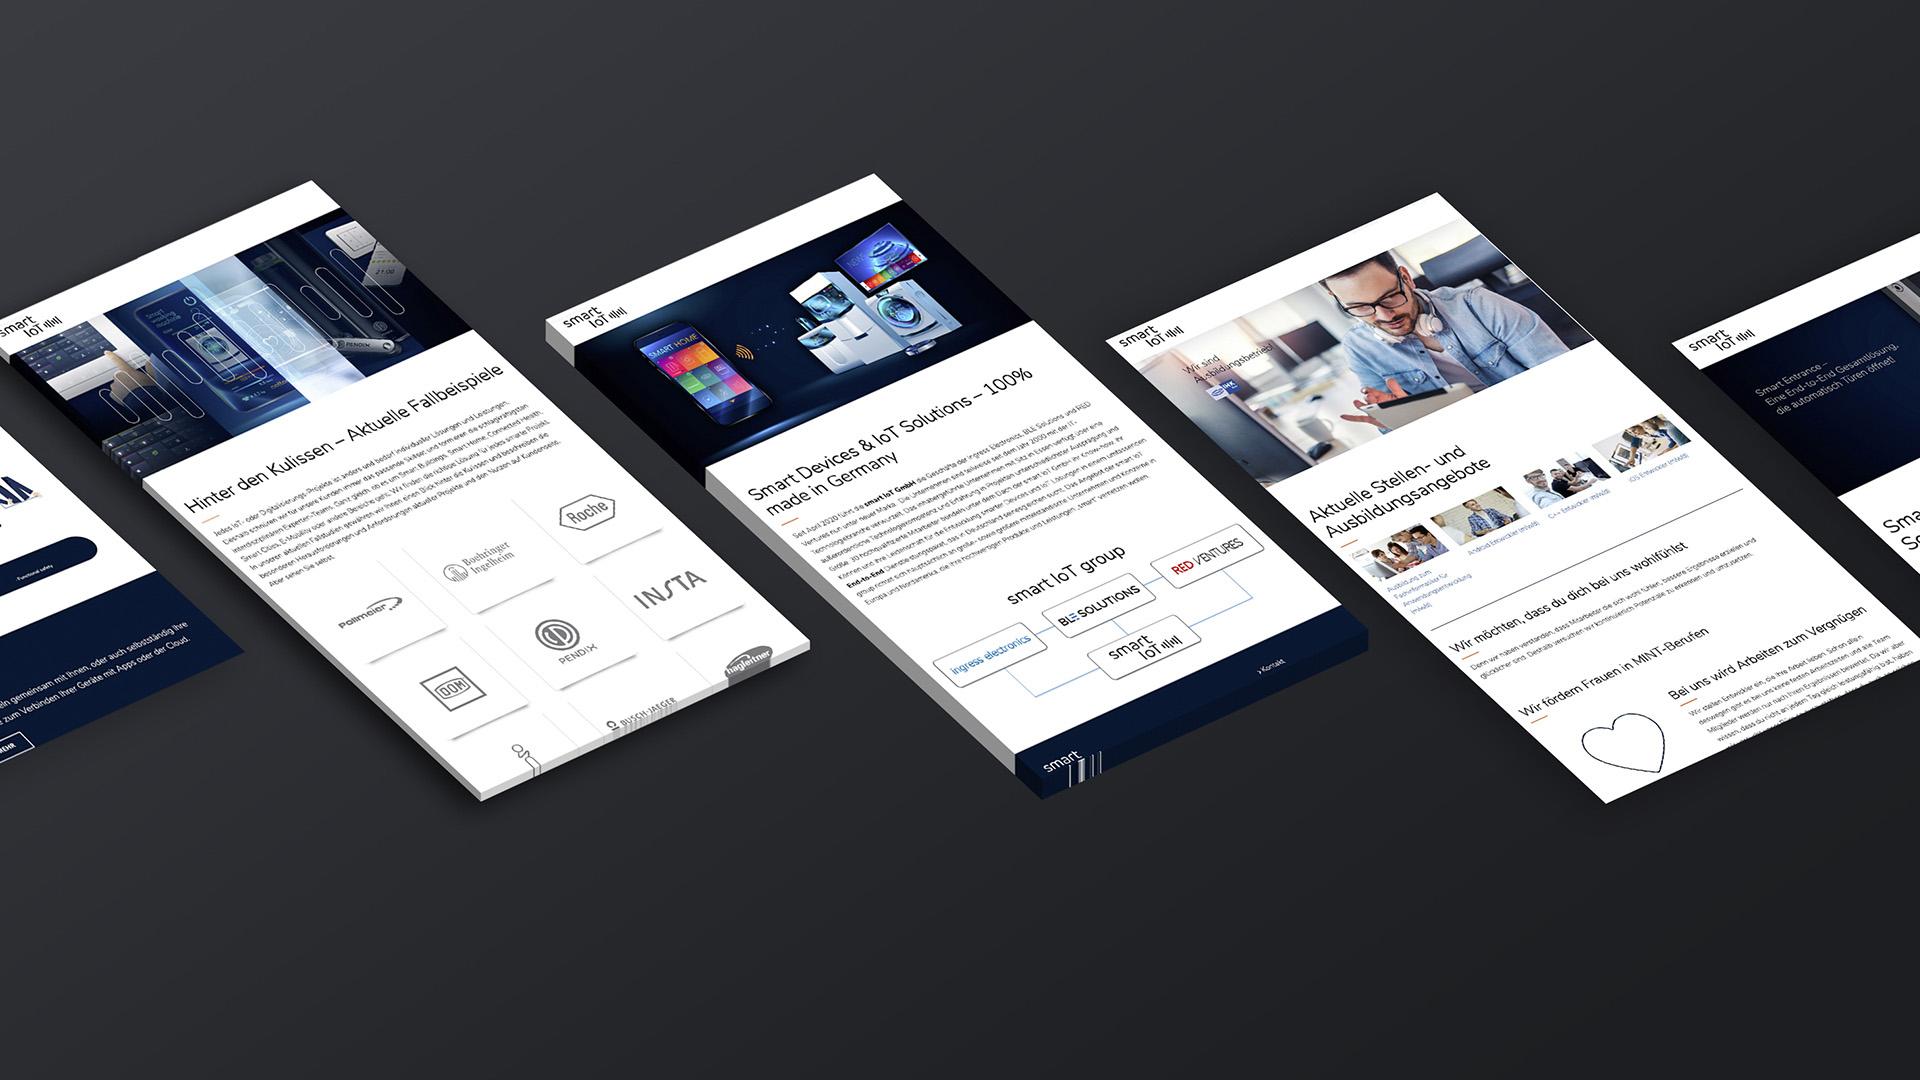 Userinterfaces smart IoT